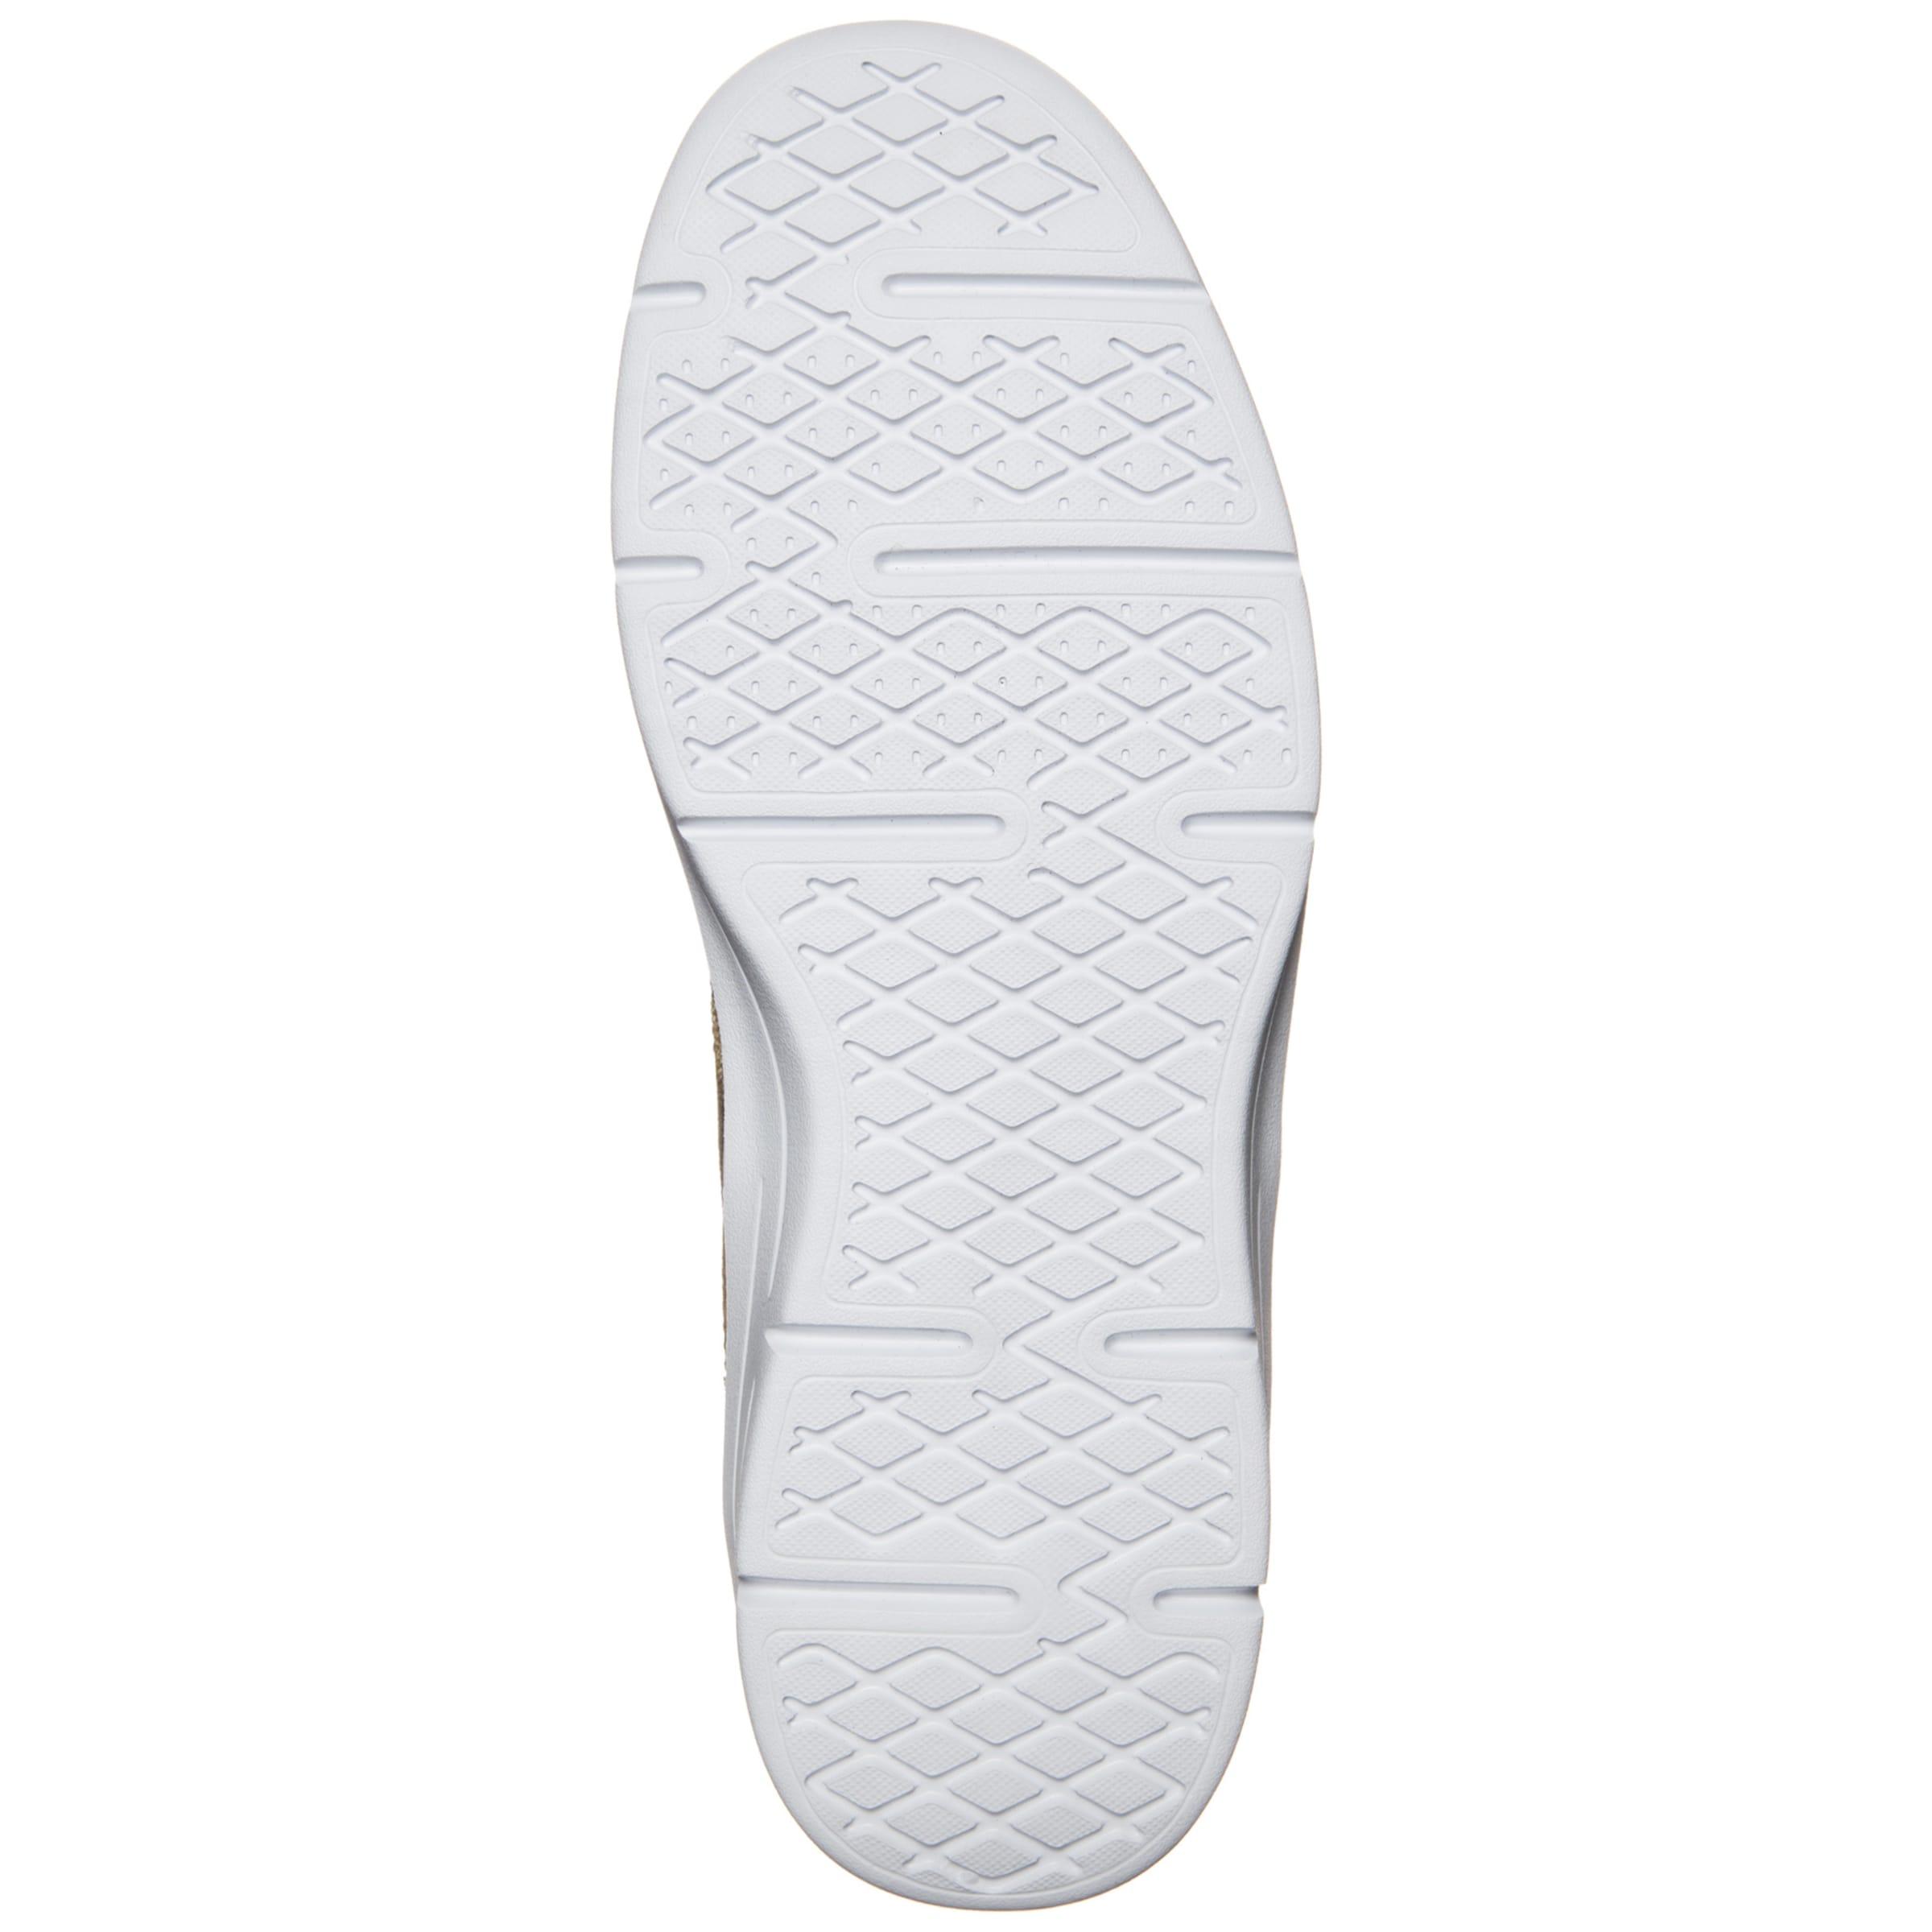 VANS Bequem, 'Iso 1.5 C&L' Turnschuhe Herren Textil, Leder Bequem, VANS gut aussehend 6288c6